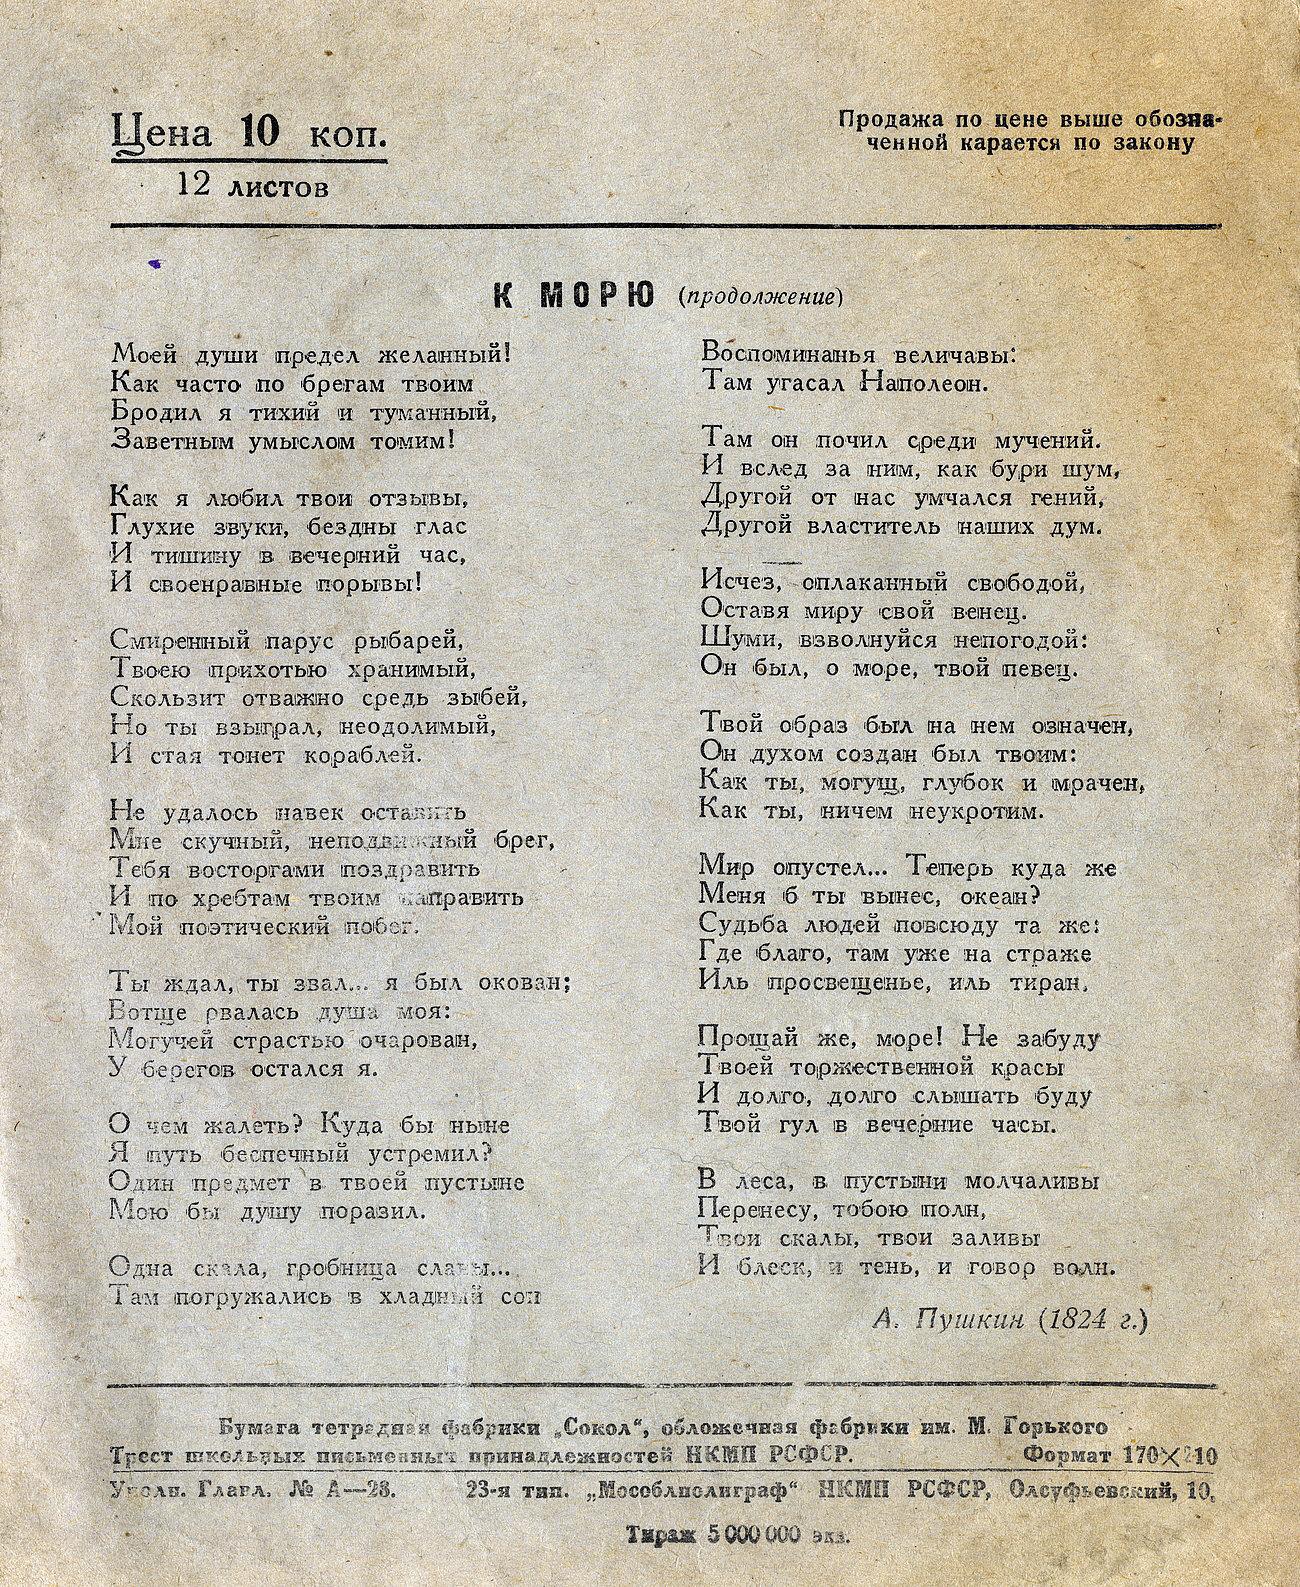 Тетрадь Пушкин (5), оборот